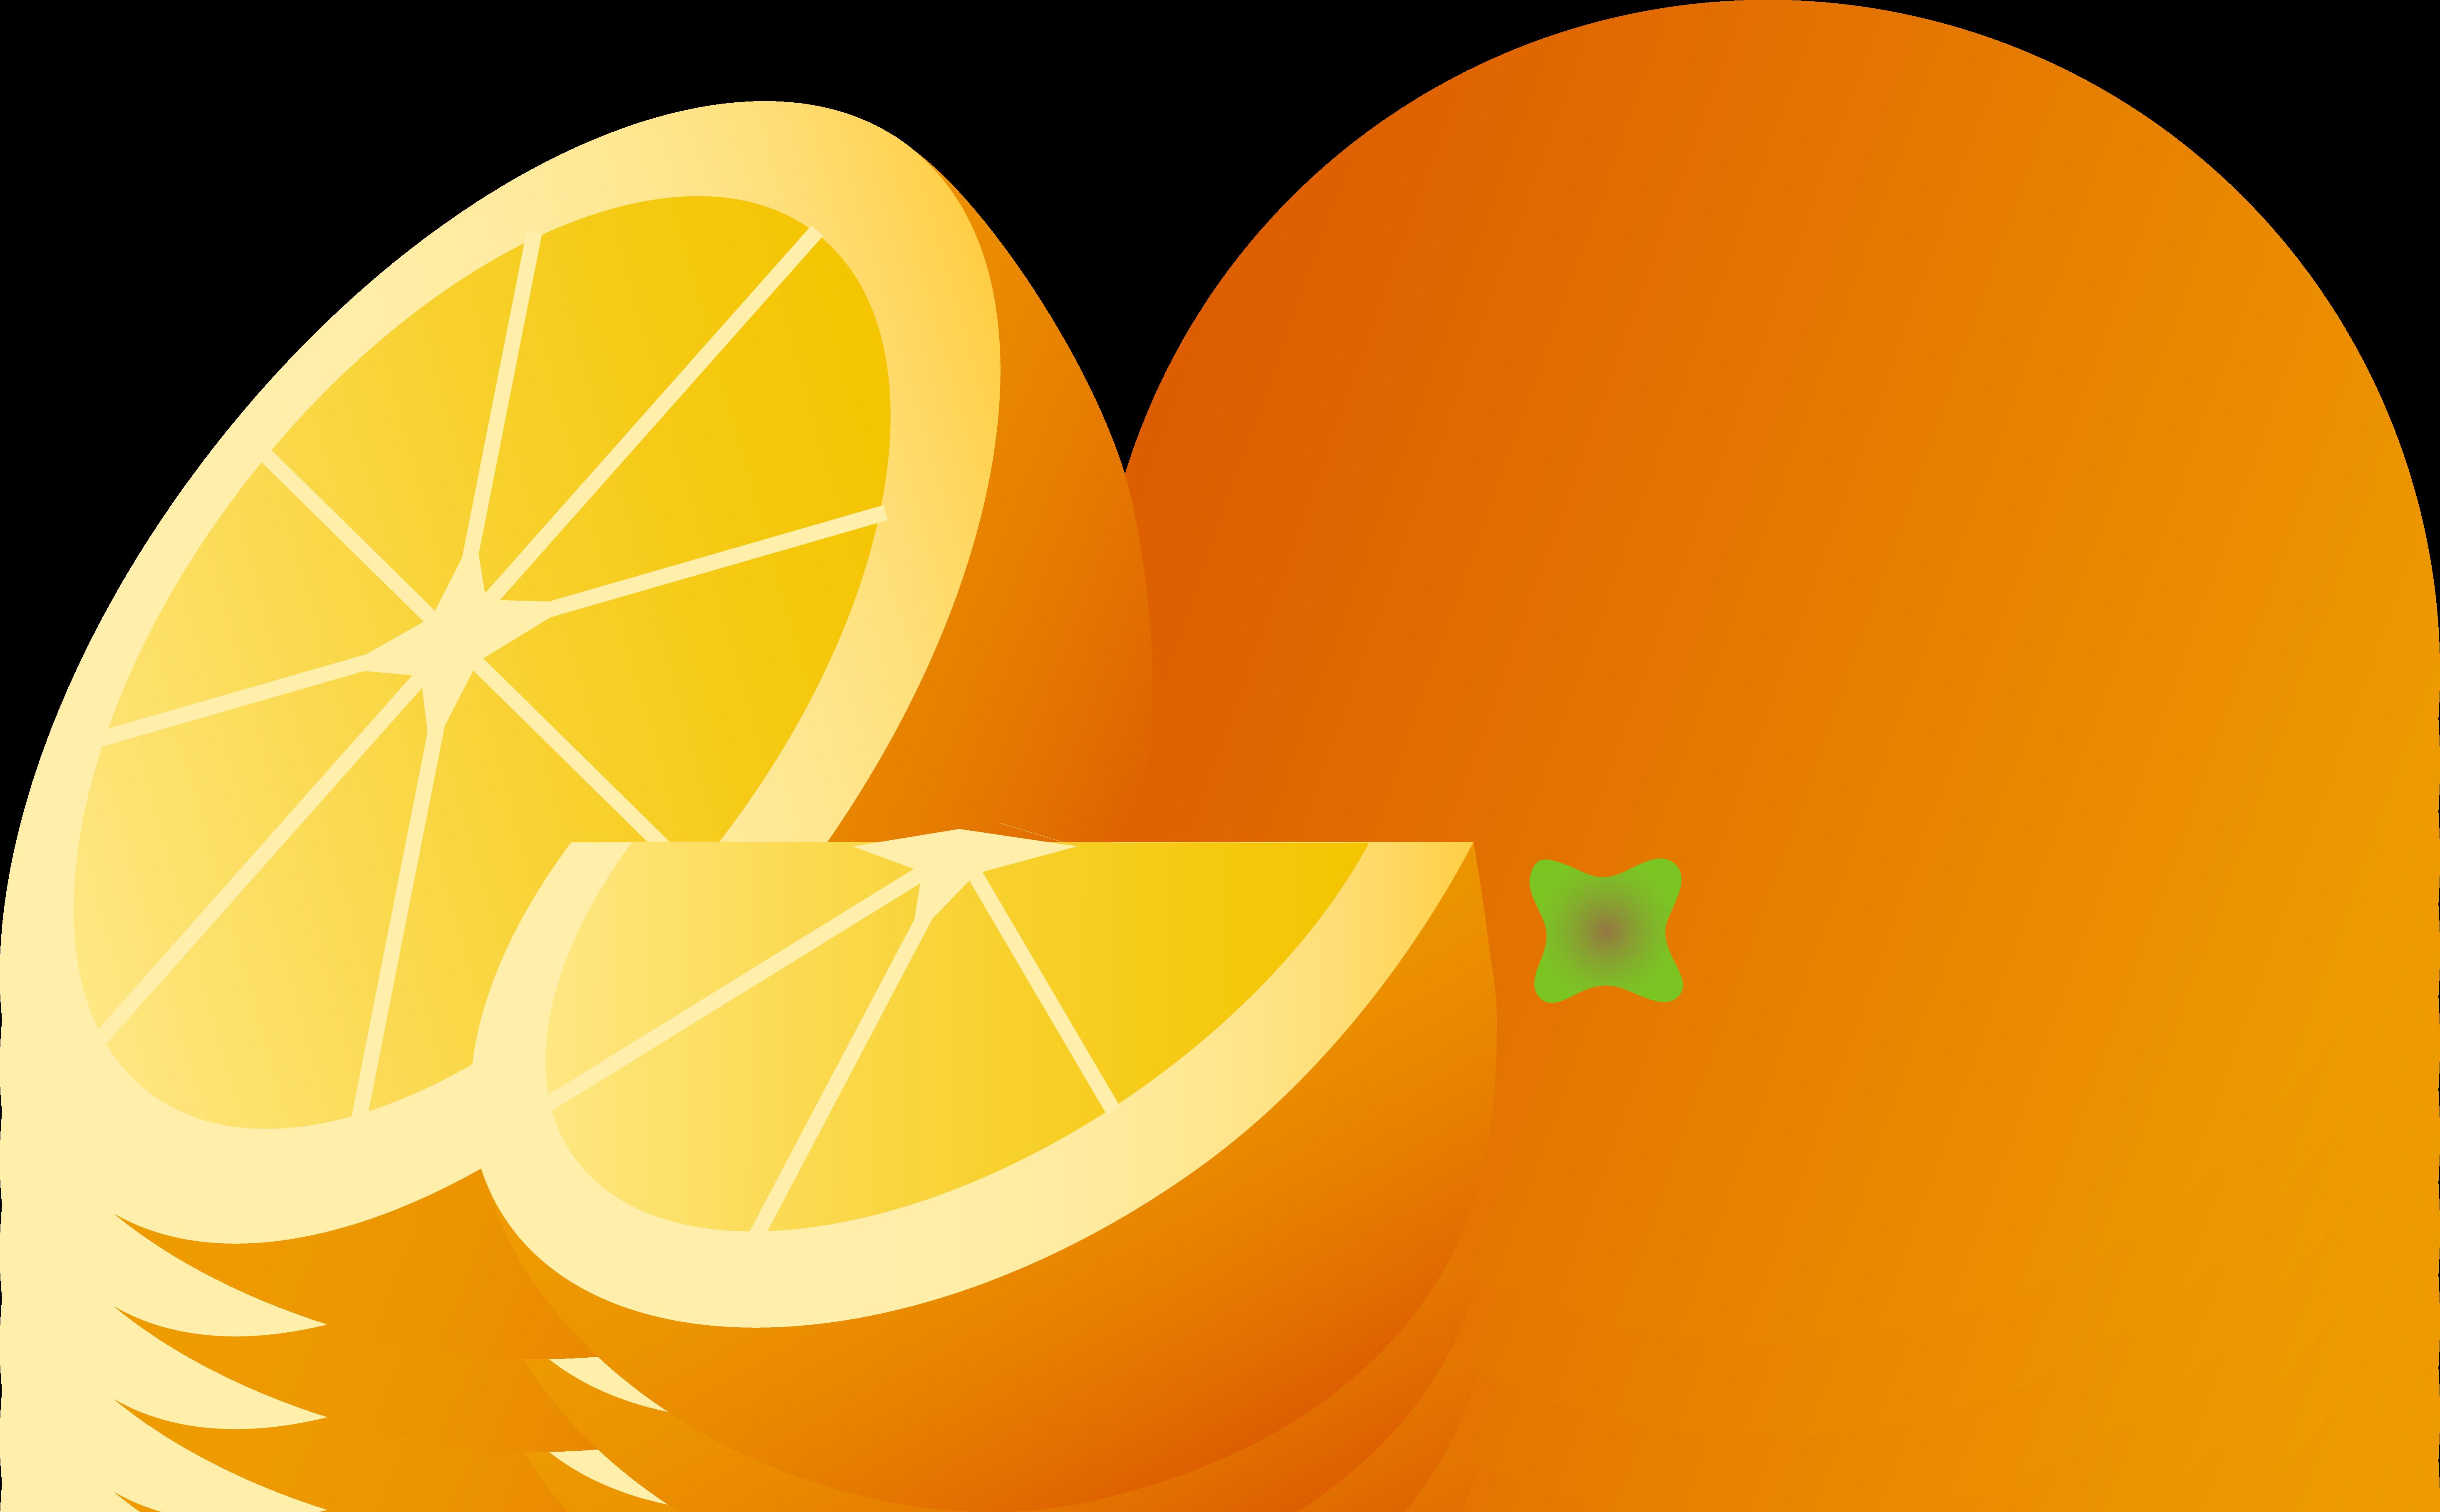 Simple Orange Fruit Clipart Free Clip Ar-Simple Orange Fruit Clipart Free Clip Art Images-17